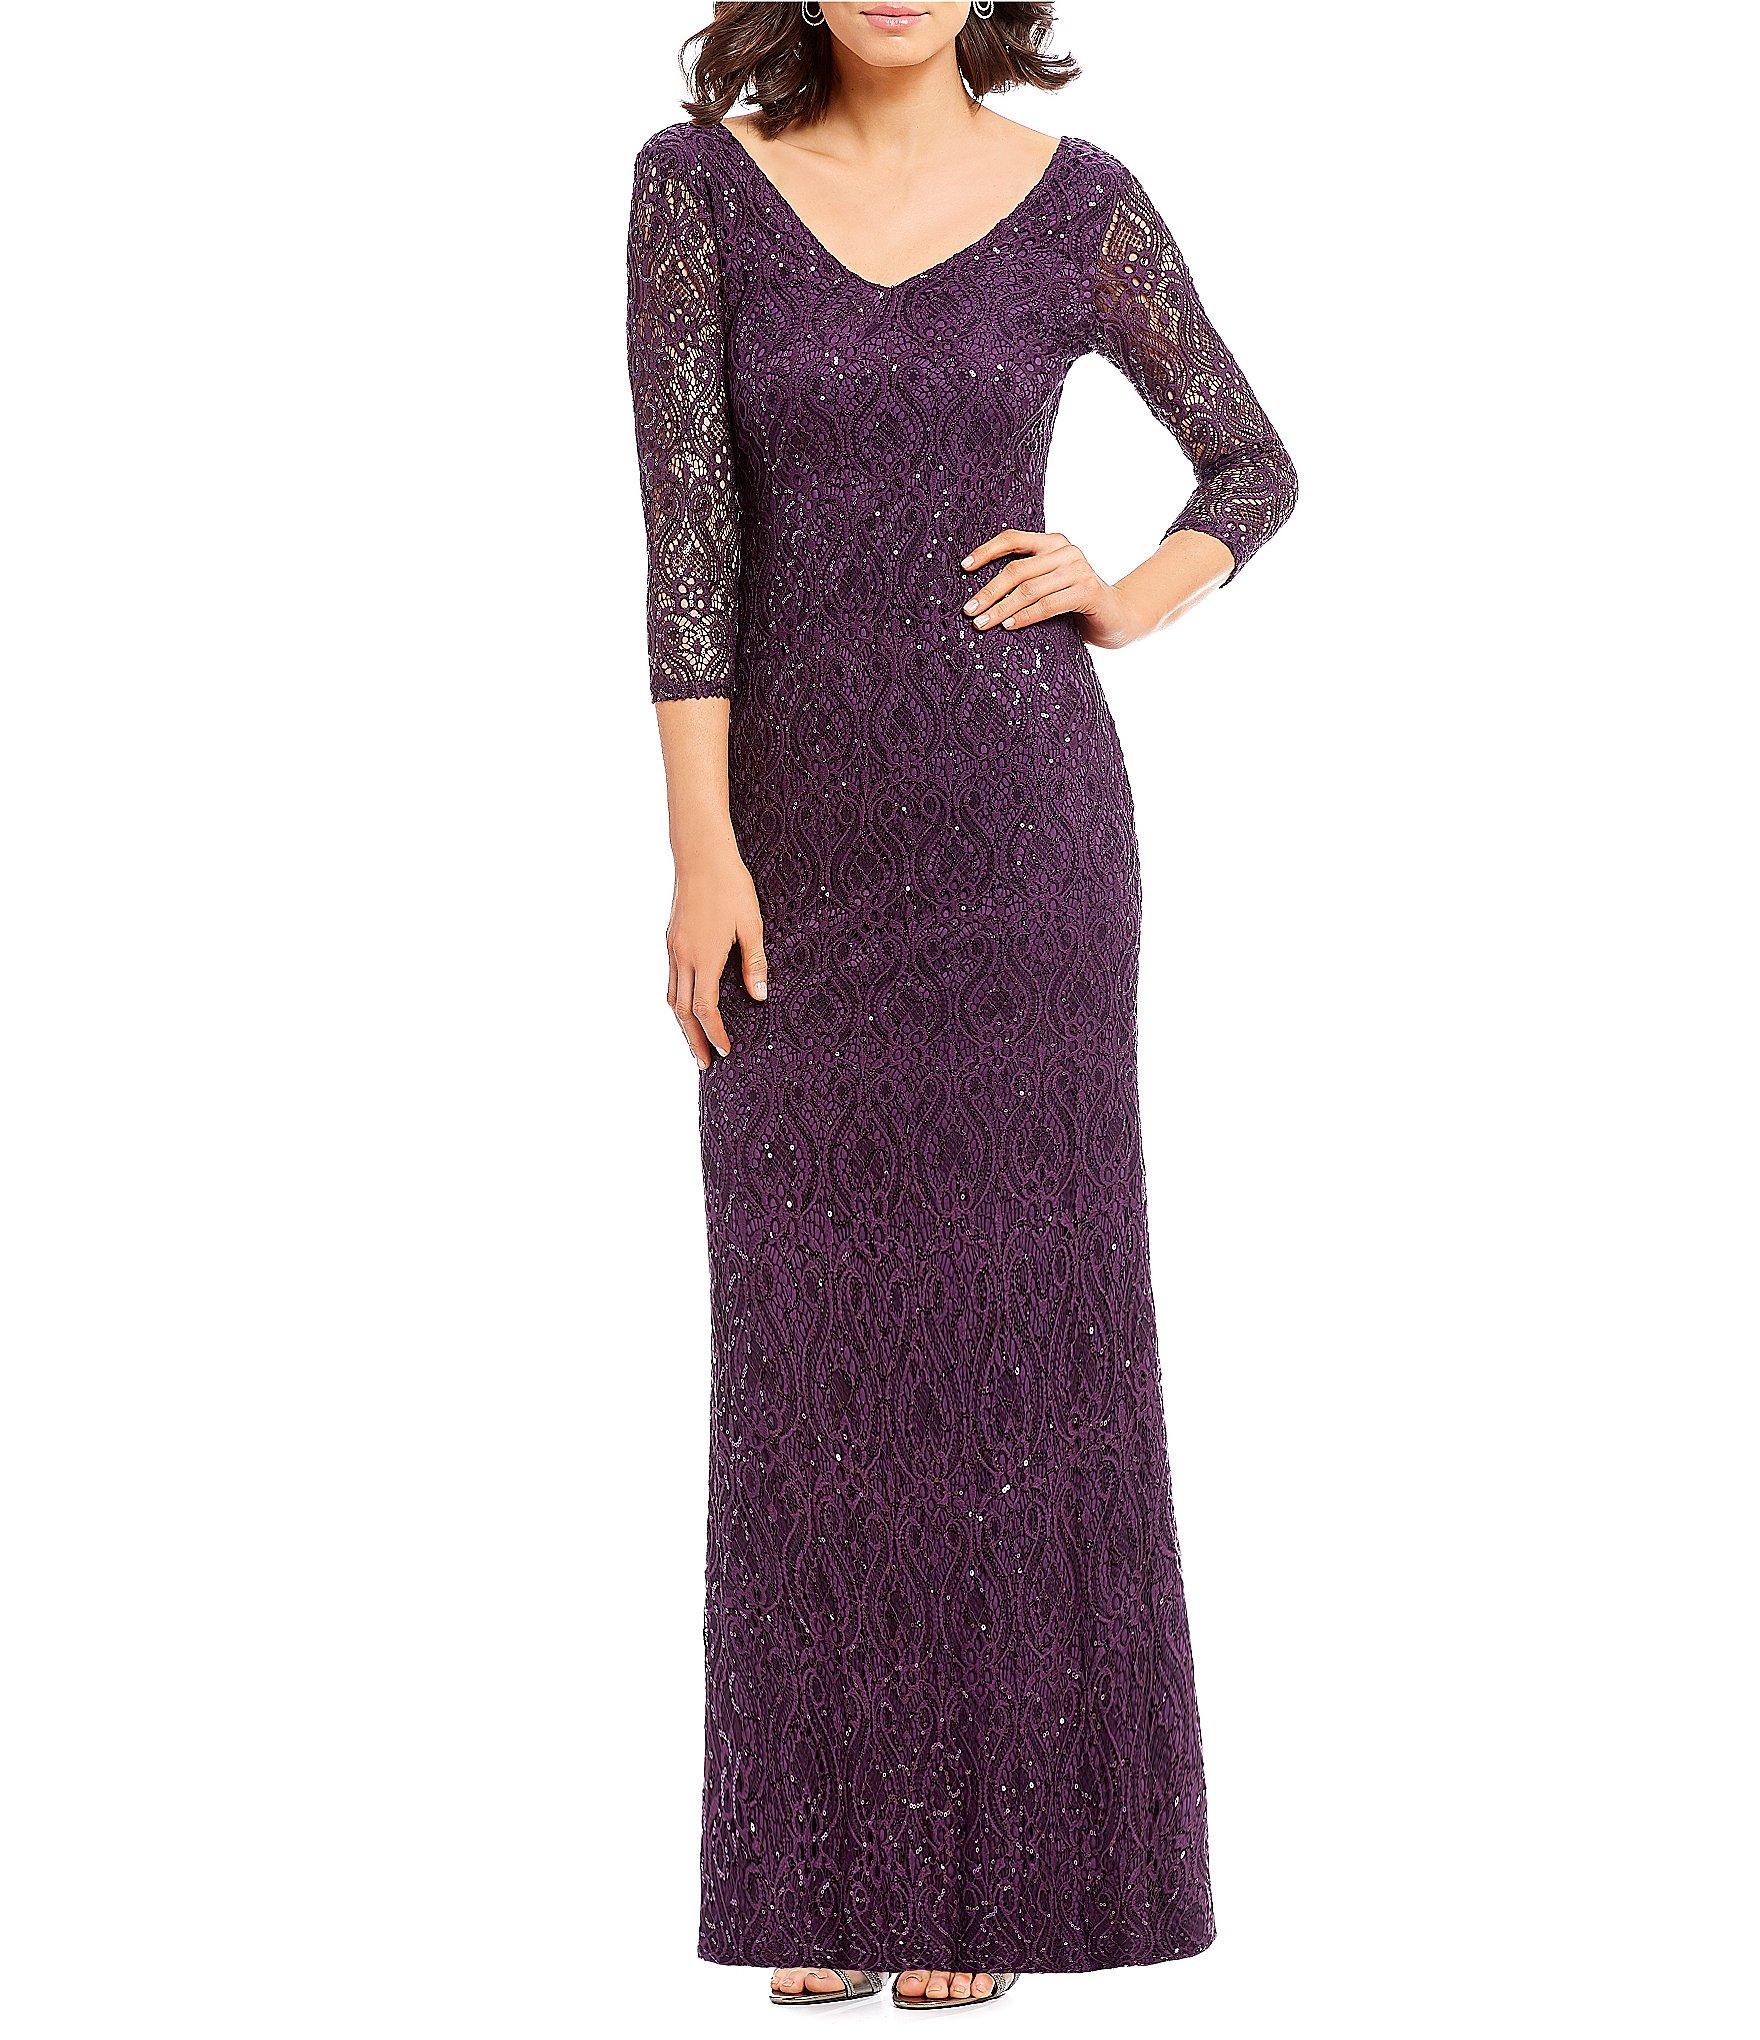 Dillards Mother of Bride Dresses Purple